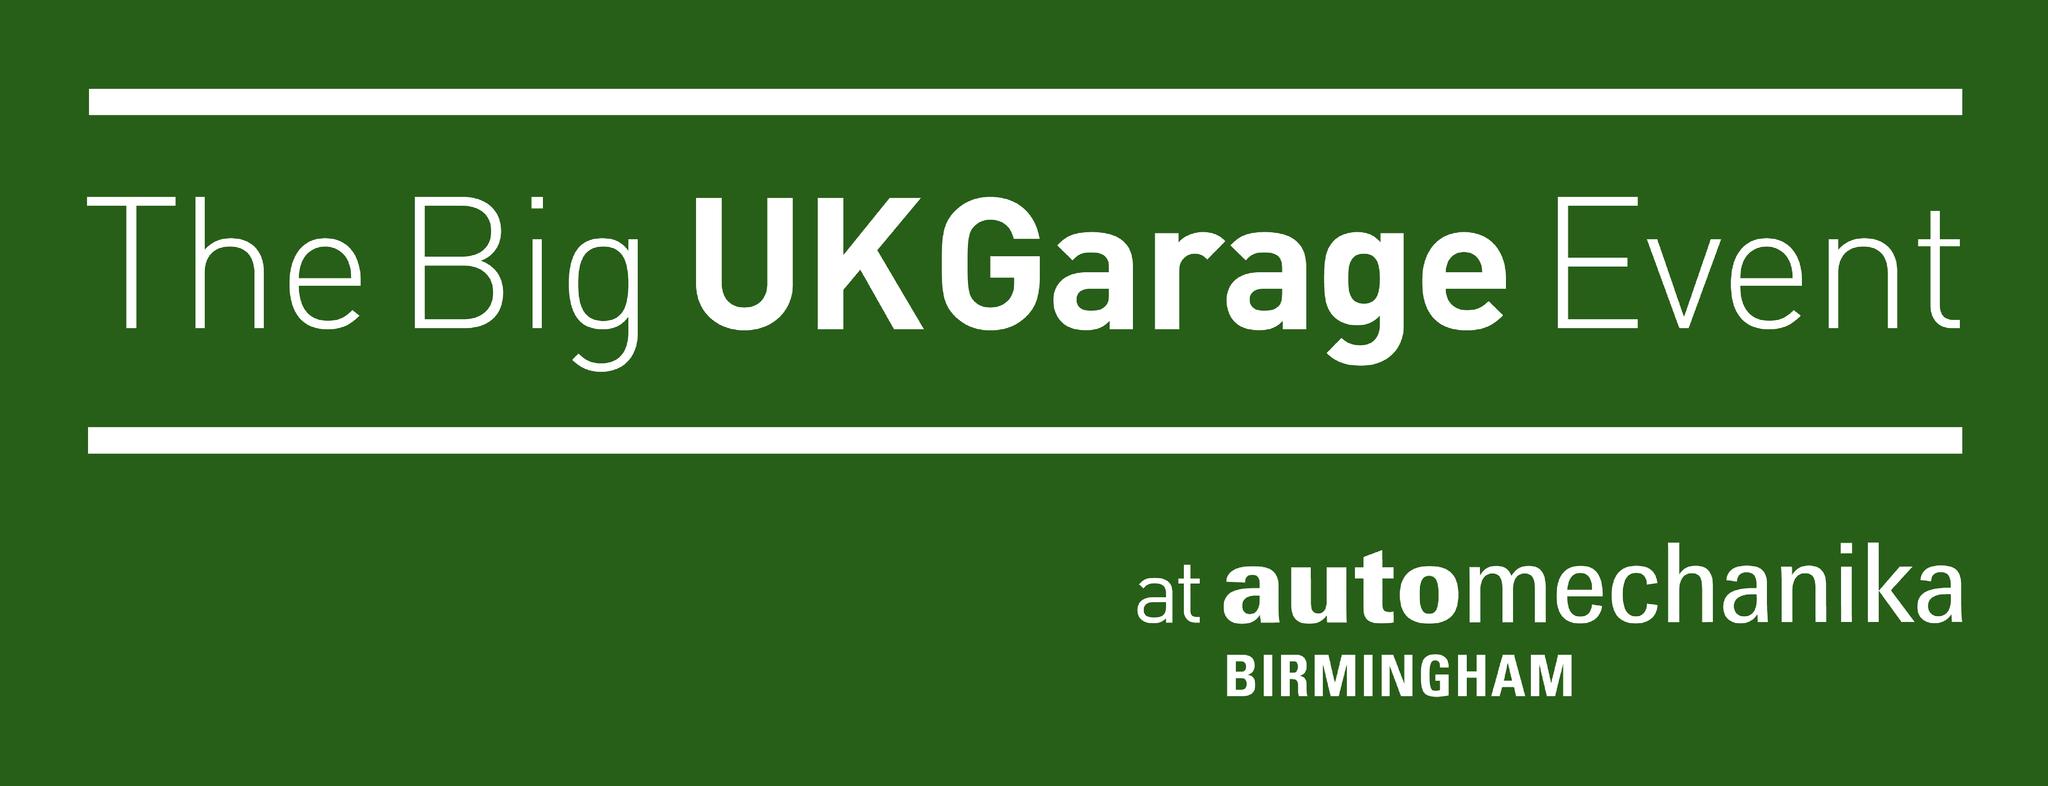 The Big UK Garage Event